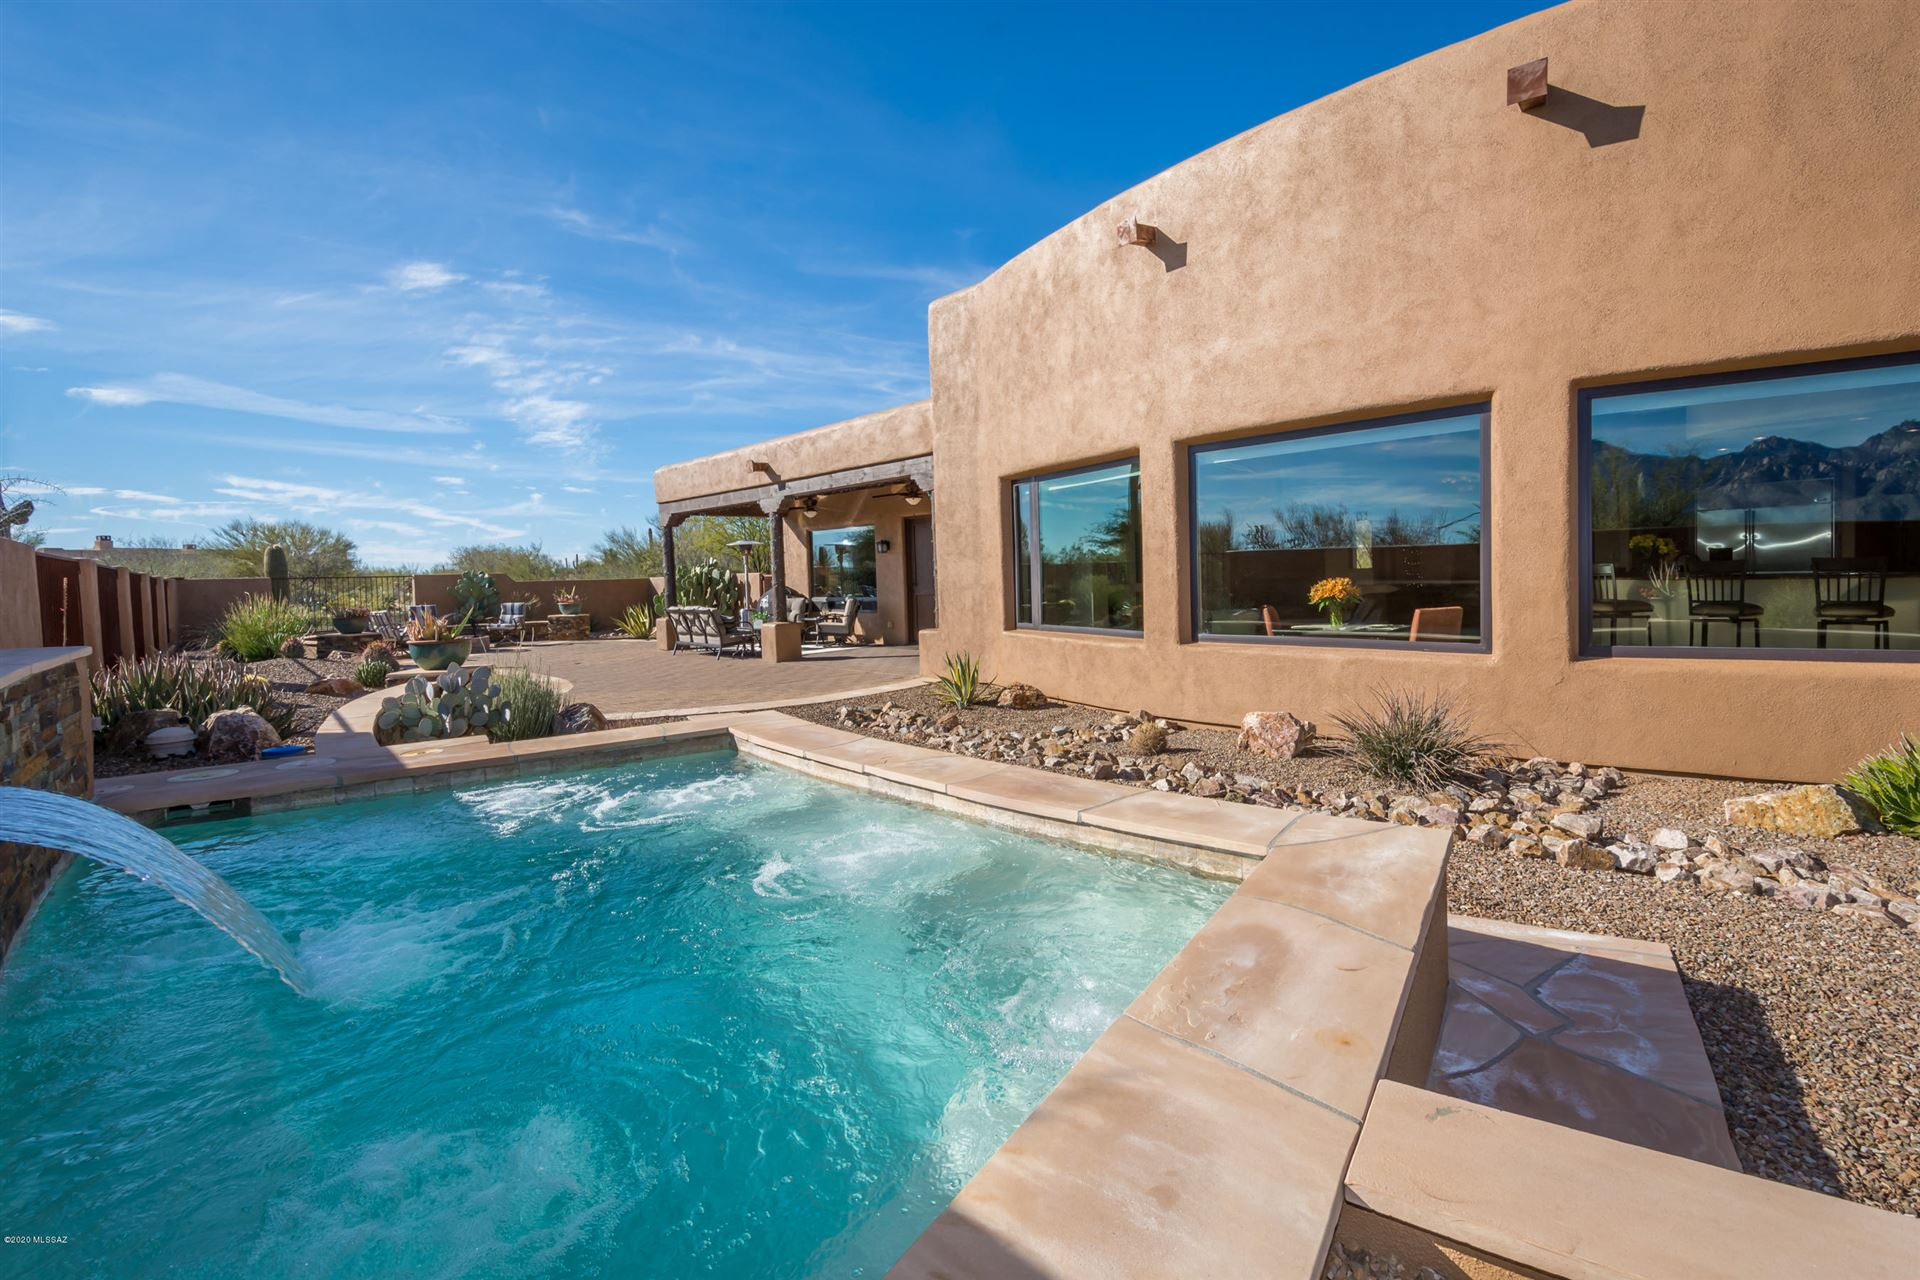 14098 N Silver Cloud Drive, Oro Valley, AZ 85755 - MLS#: 22000895